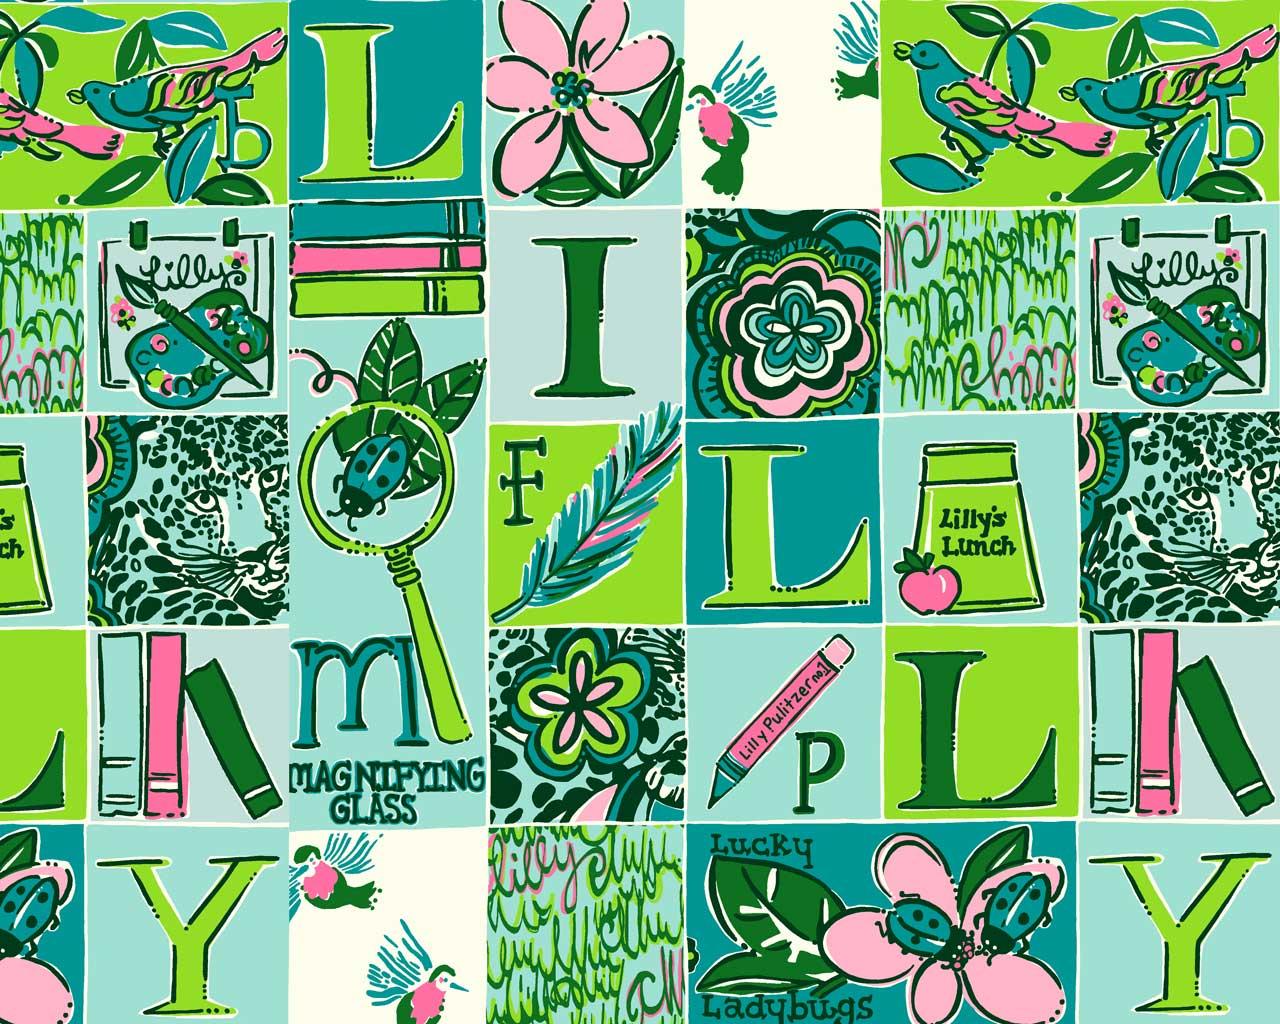 CanadianPrep-Lilly-Desktop-wallpaper-wp5002470